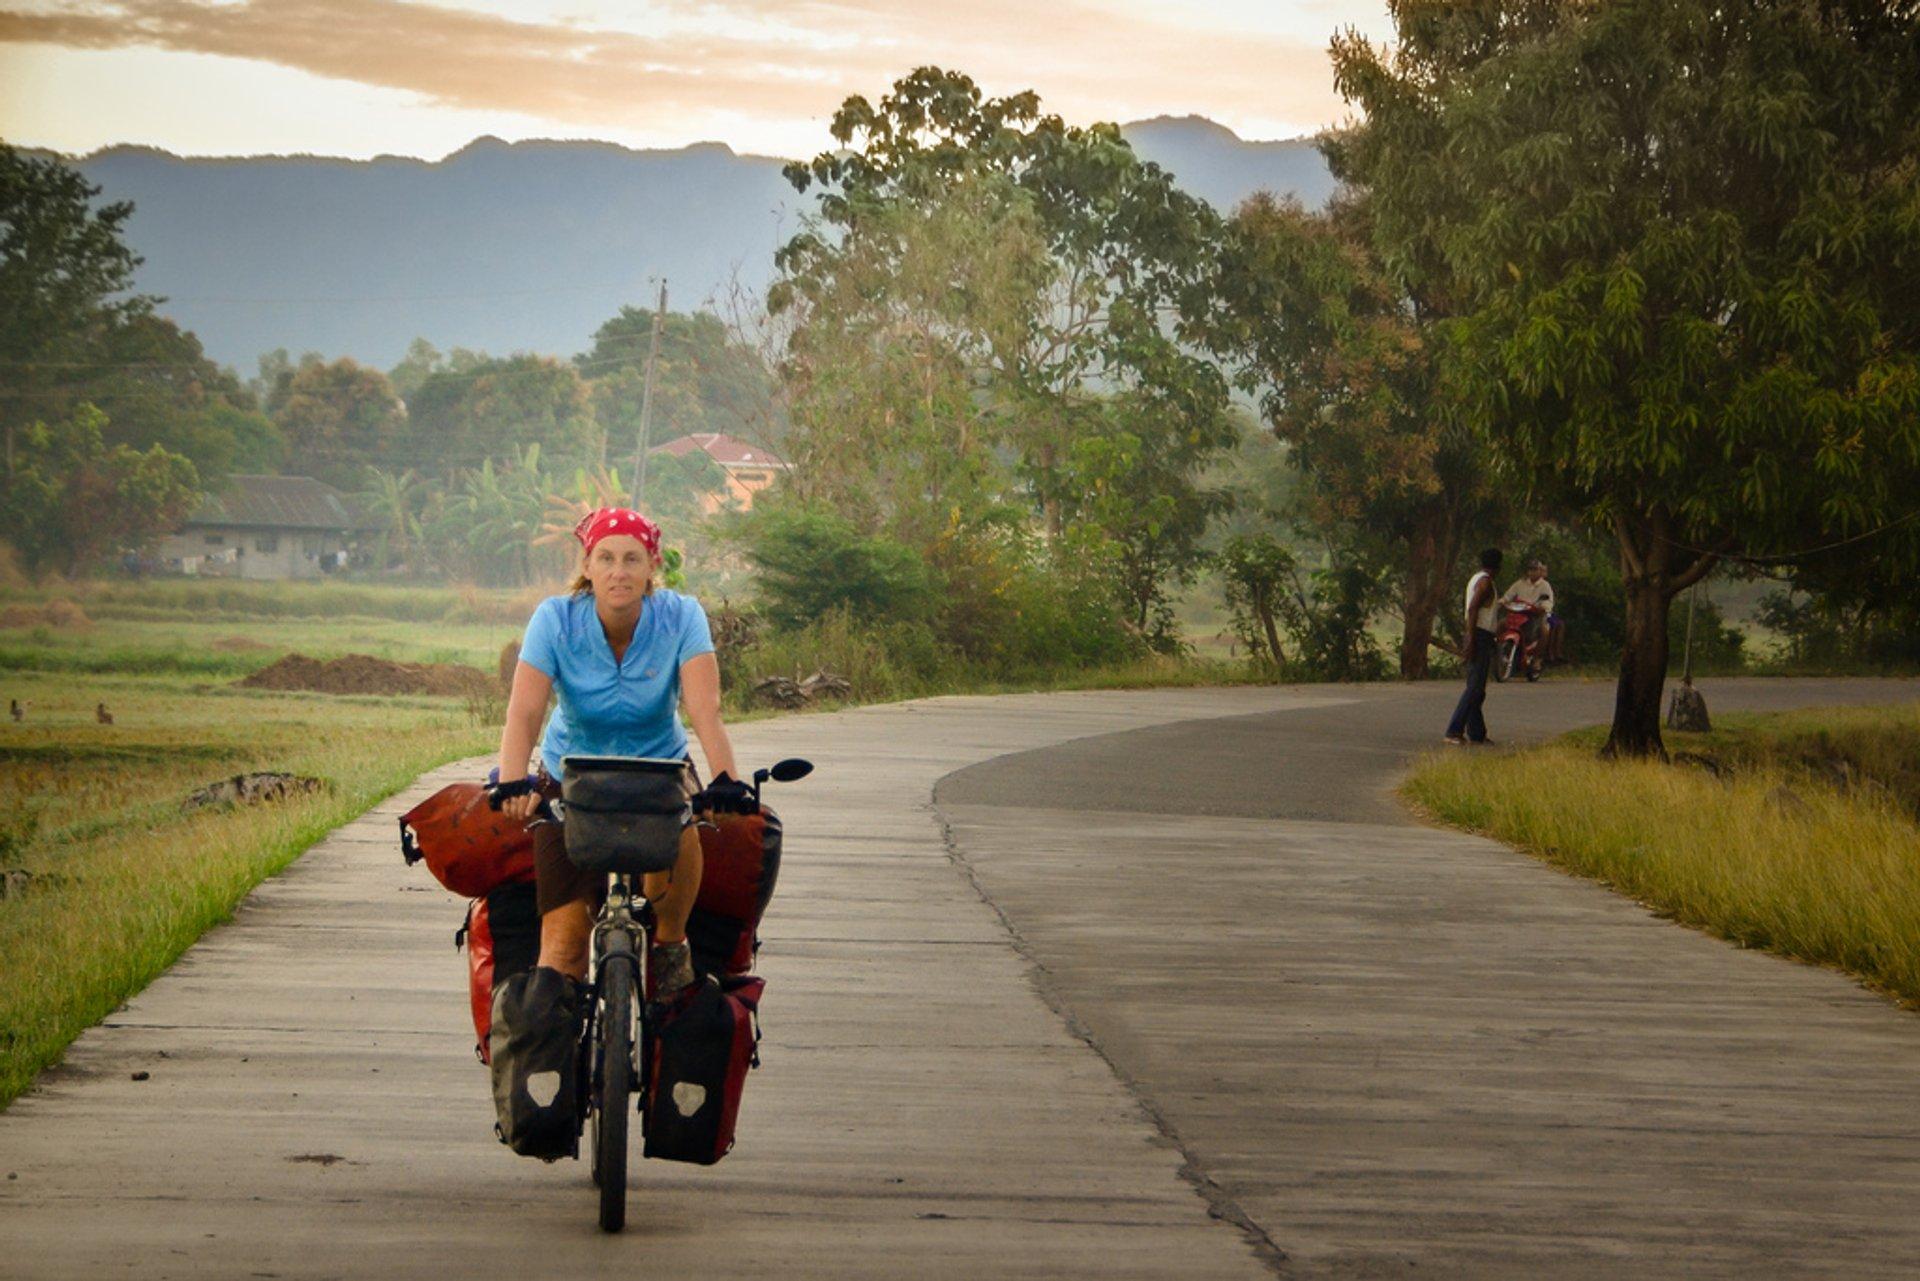 Cycling near Vigan, Philippines